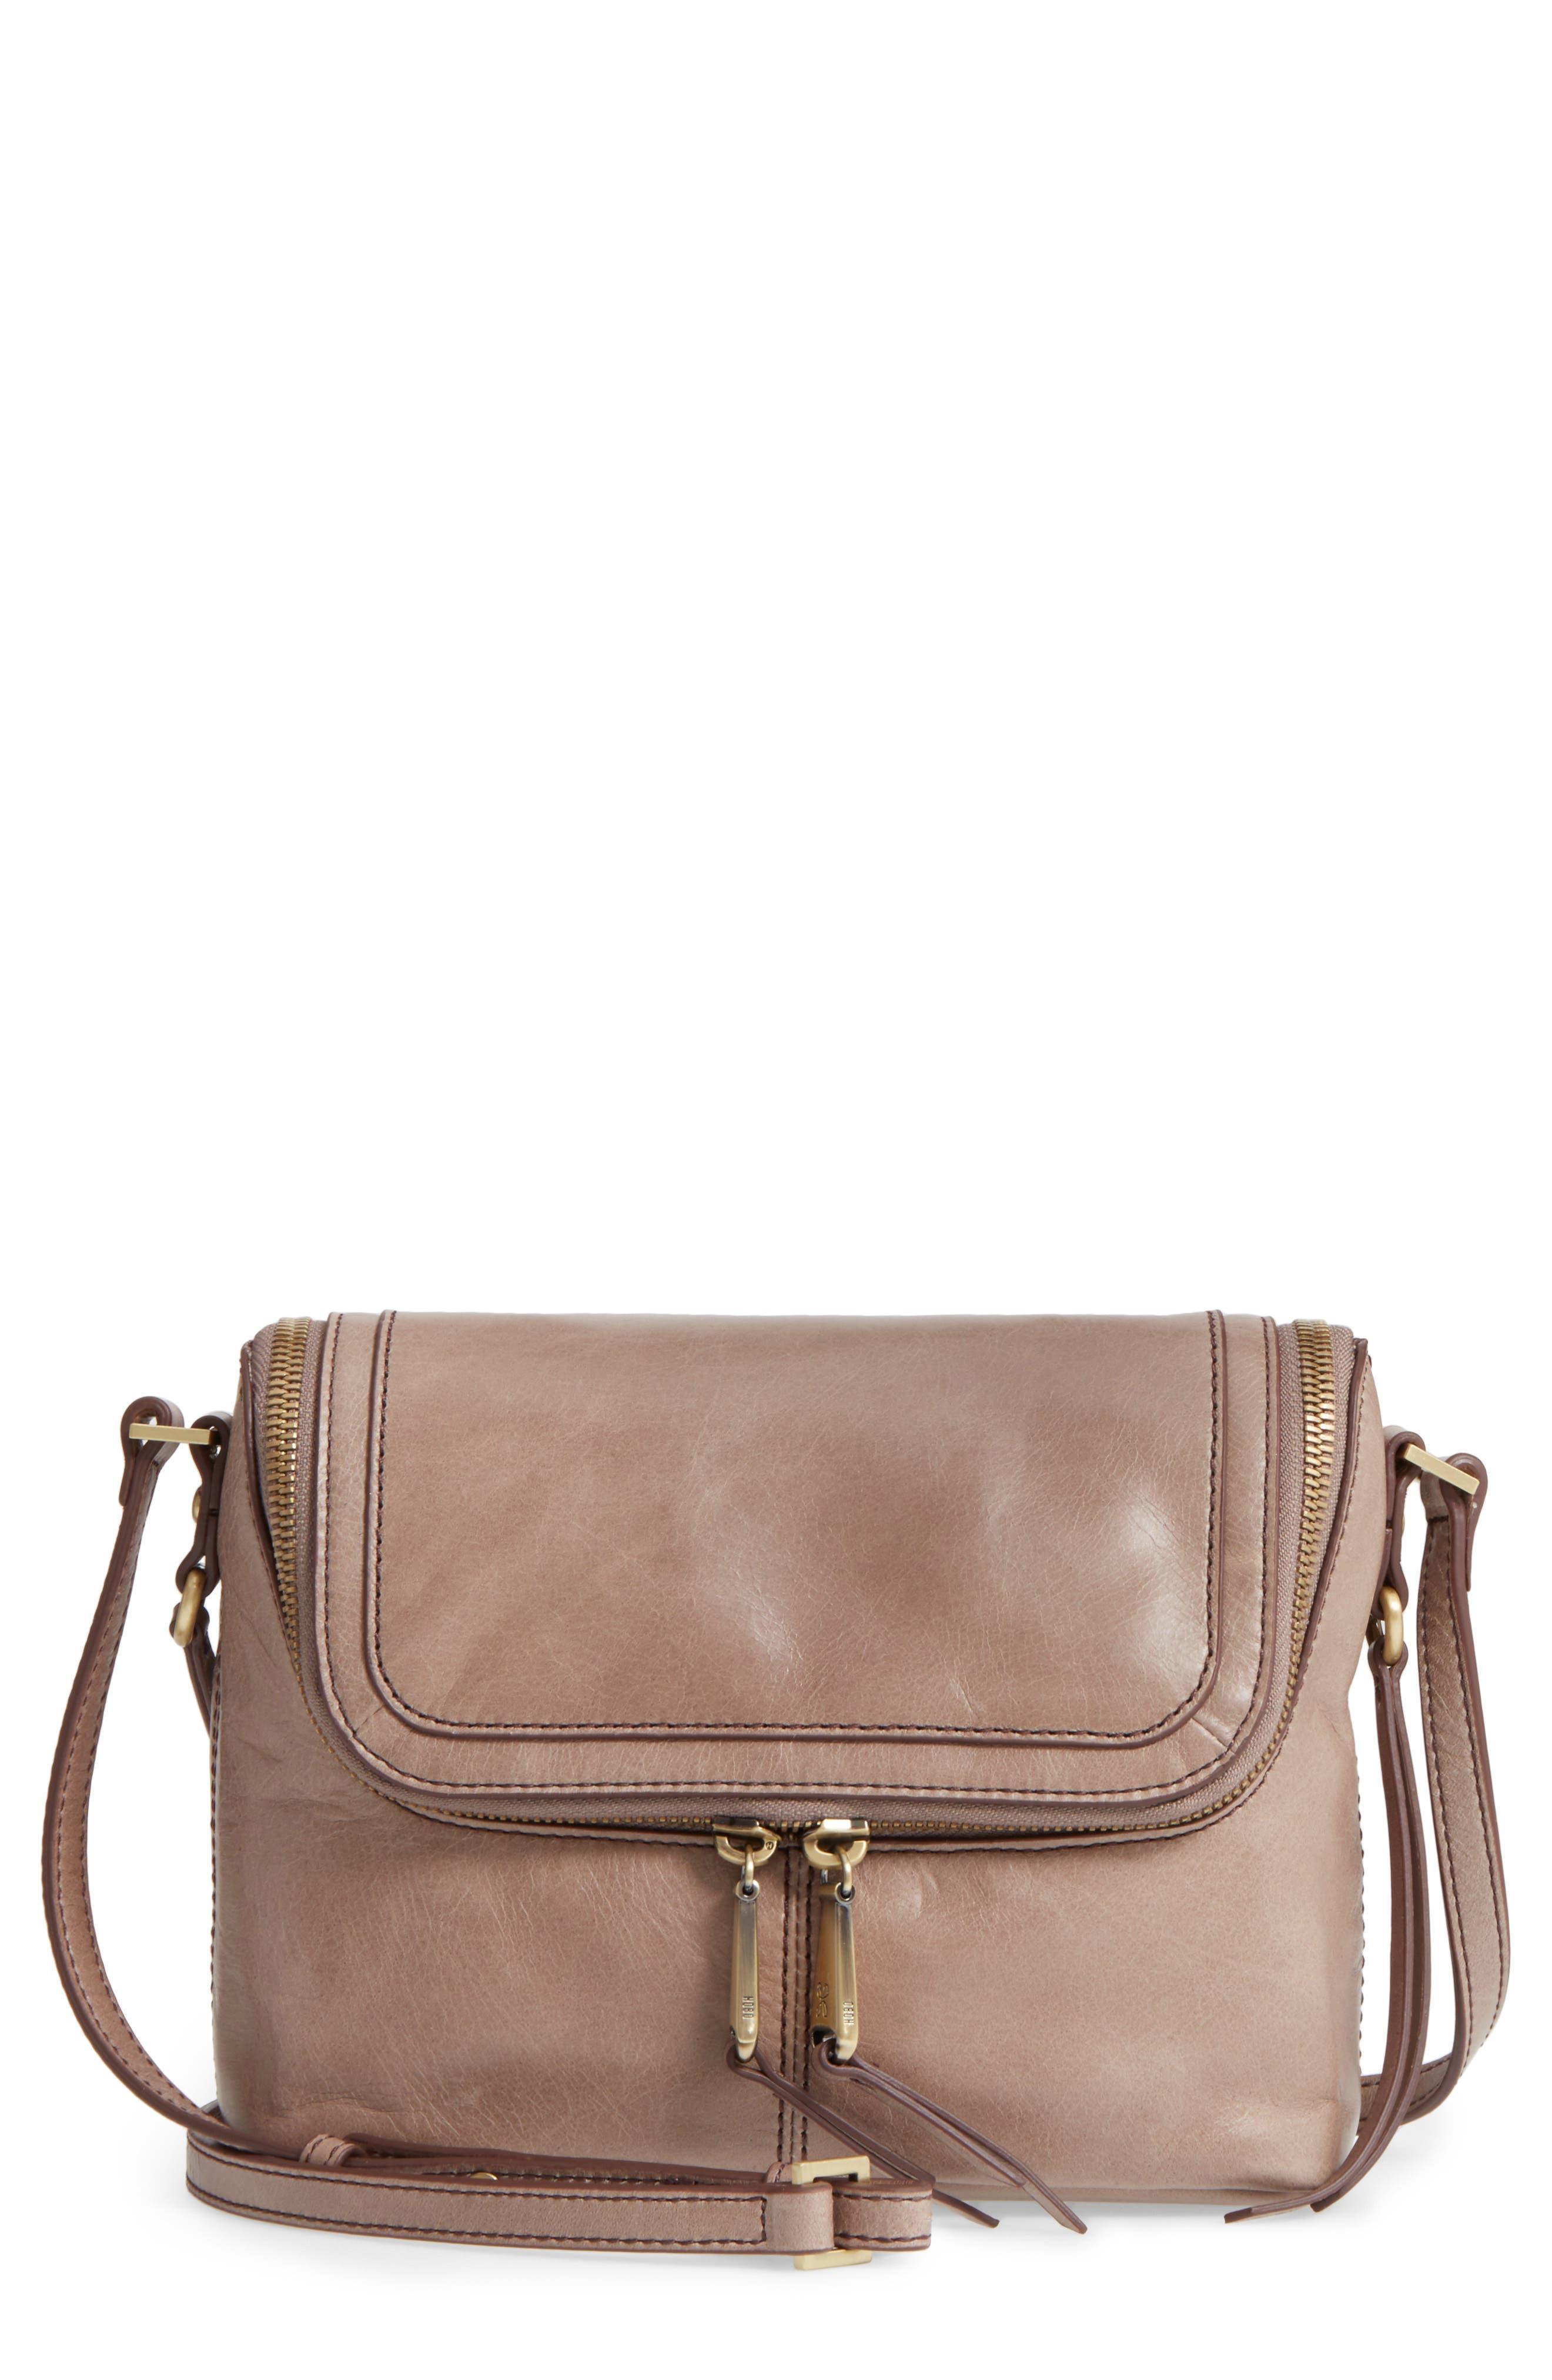 Alibi Calfskin Leather Crossbody Bag,                             Main thumbnail 1, color,                             Ash